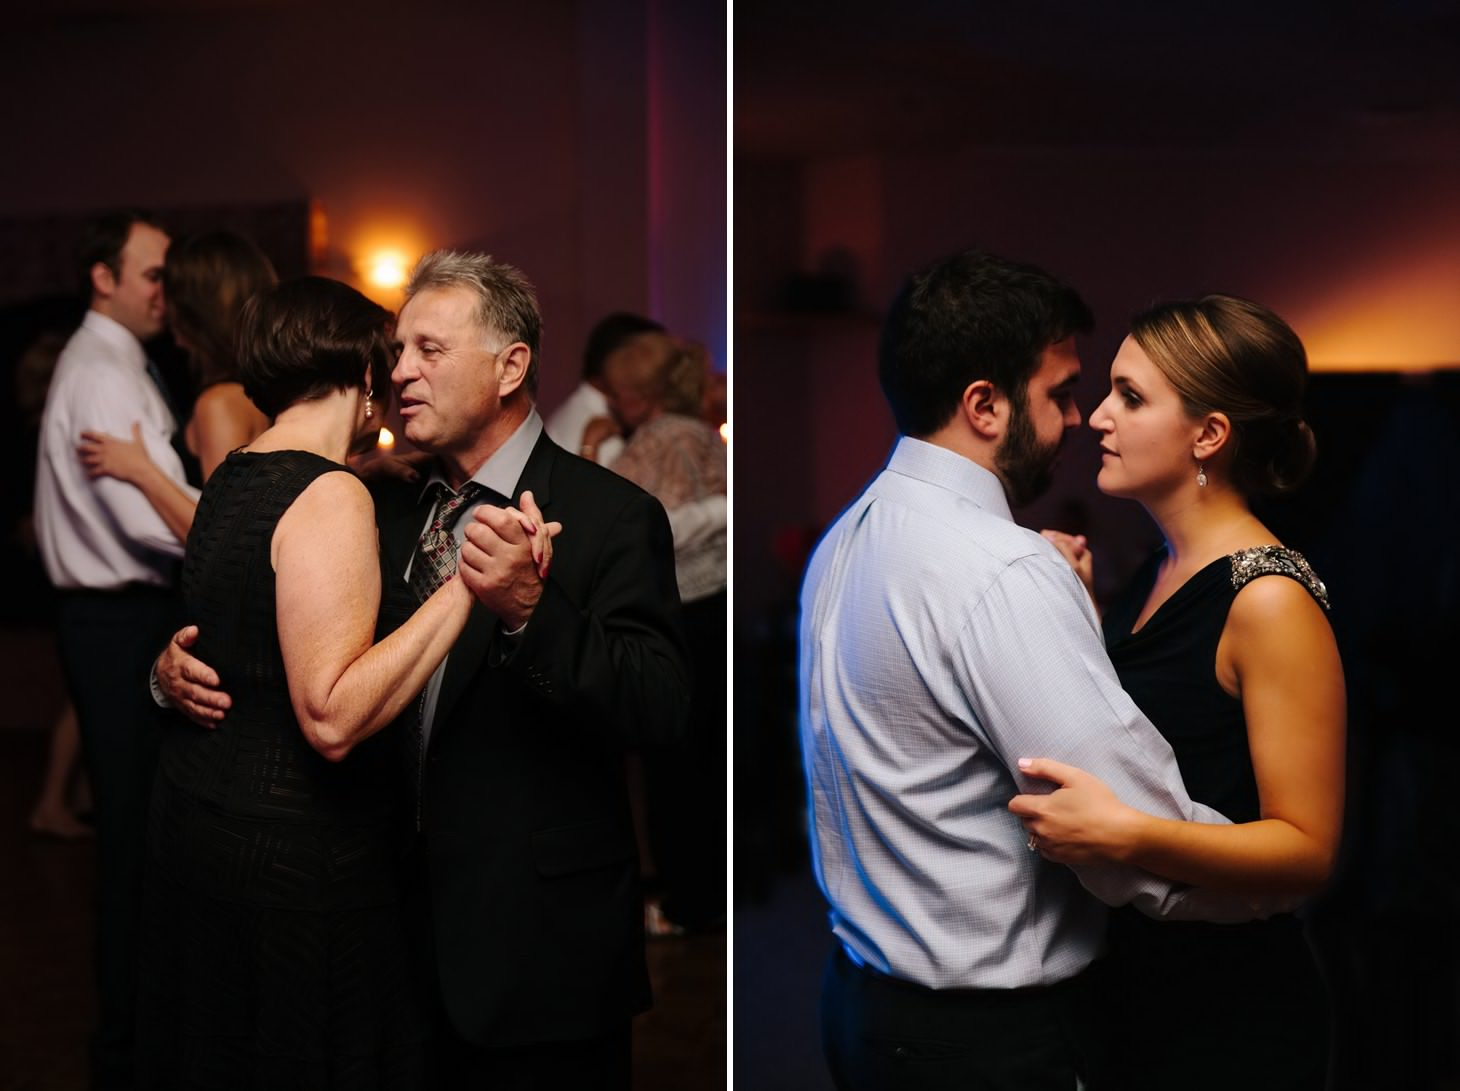 049-nyc-wedding-photographer-nj-nerdy-dr-who-firehouse-wedding-smitten-chickens.jpg